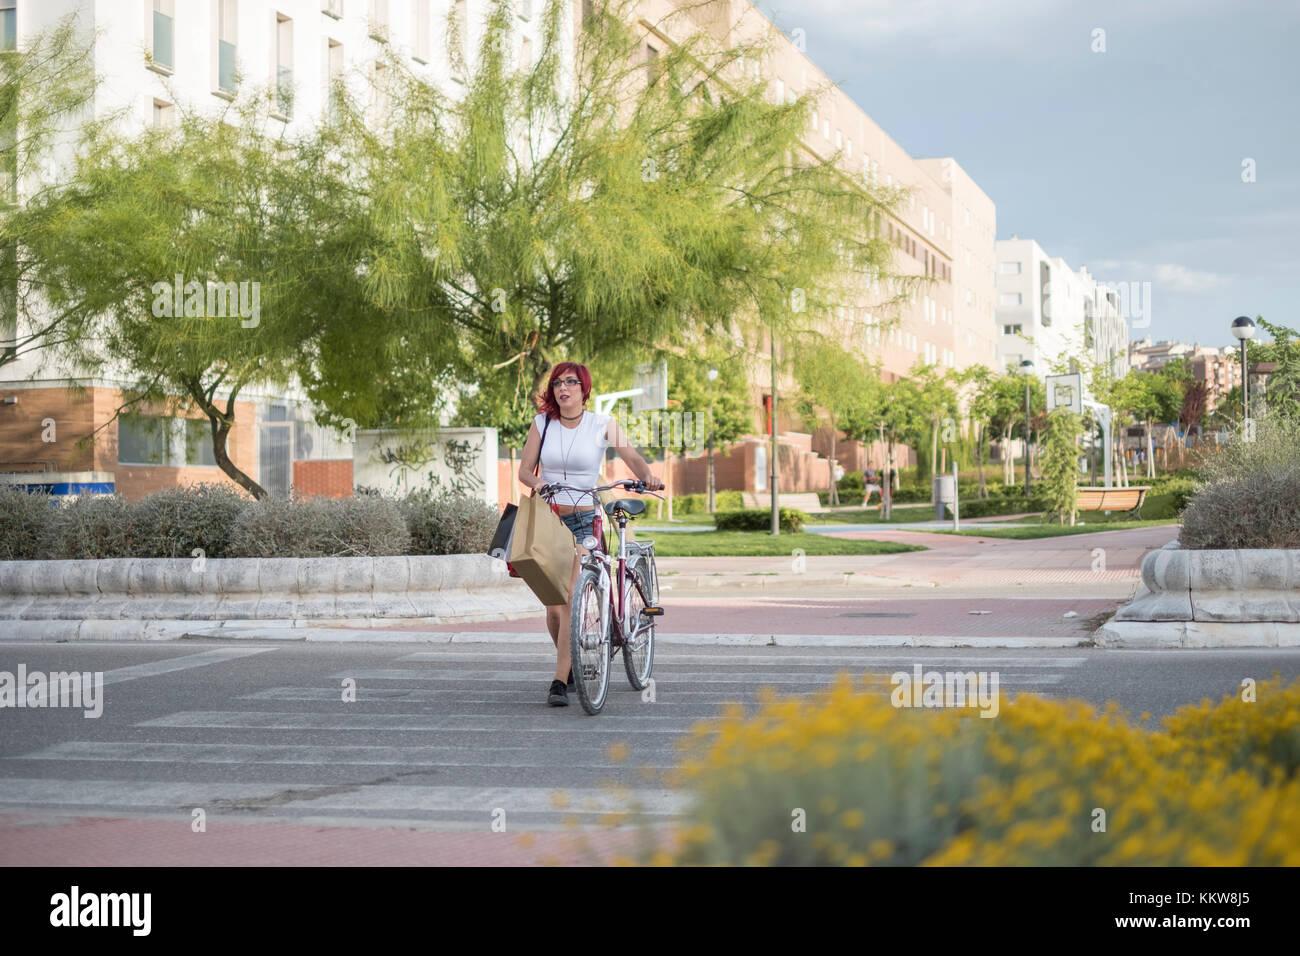 Woman with bike lifestyle on european little city of jaen - Stock Image